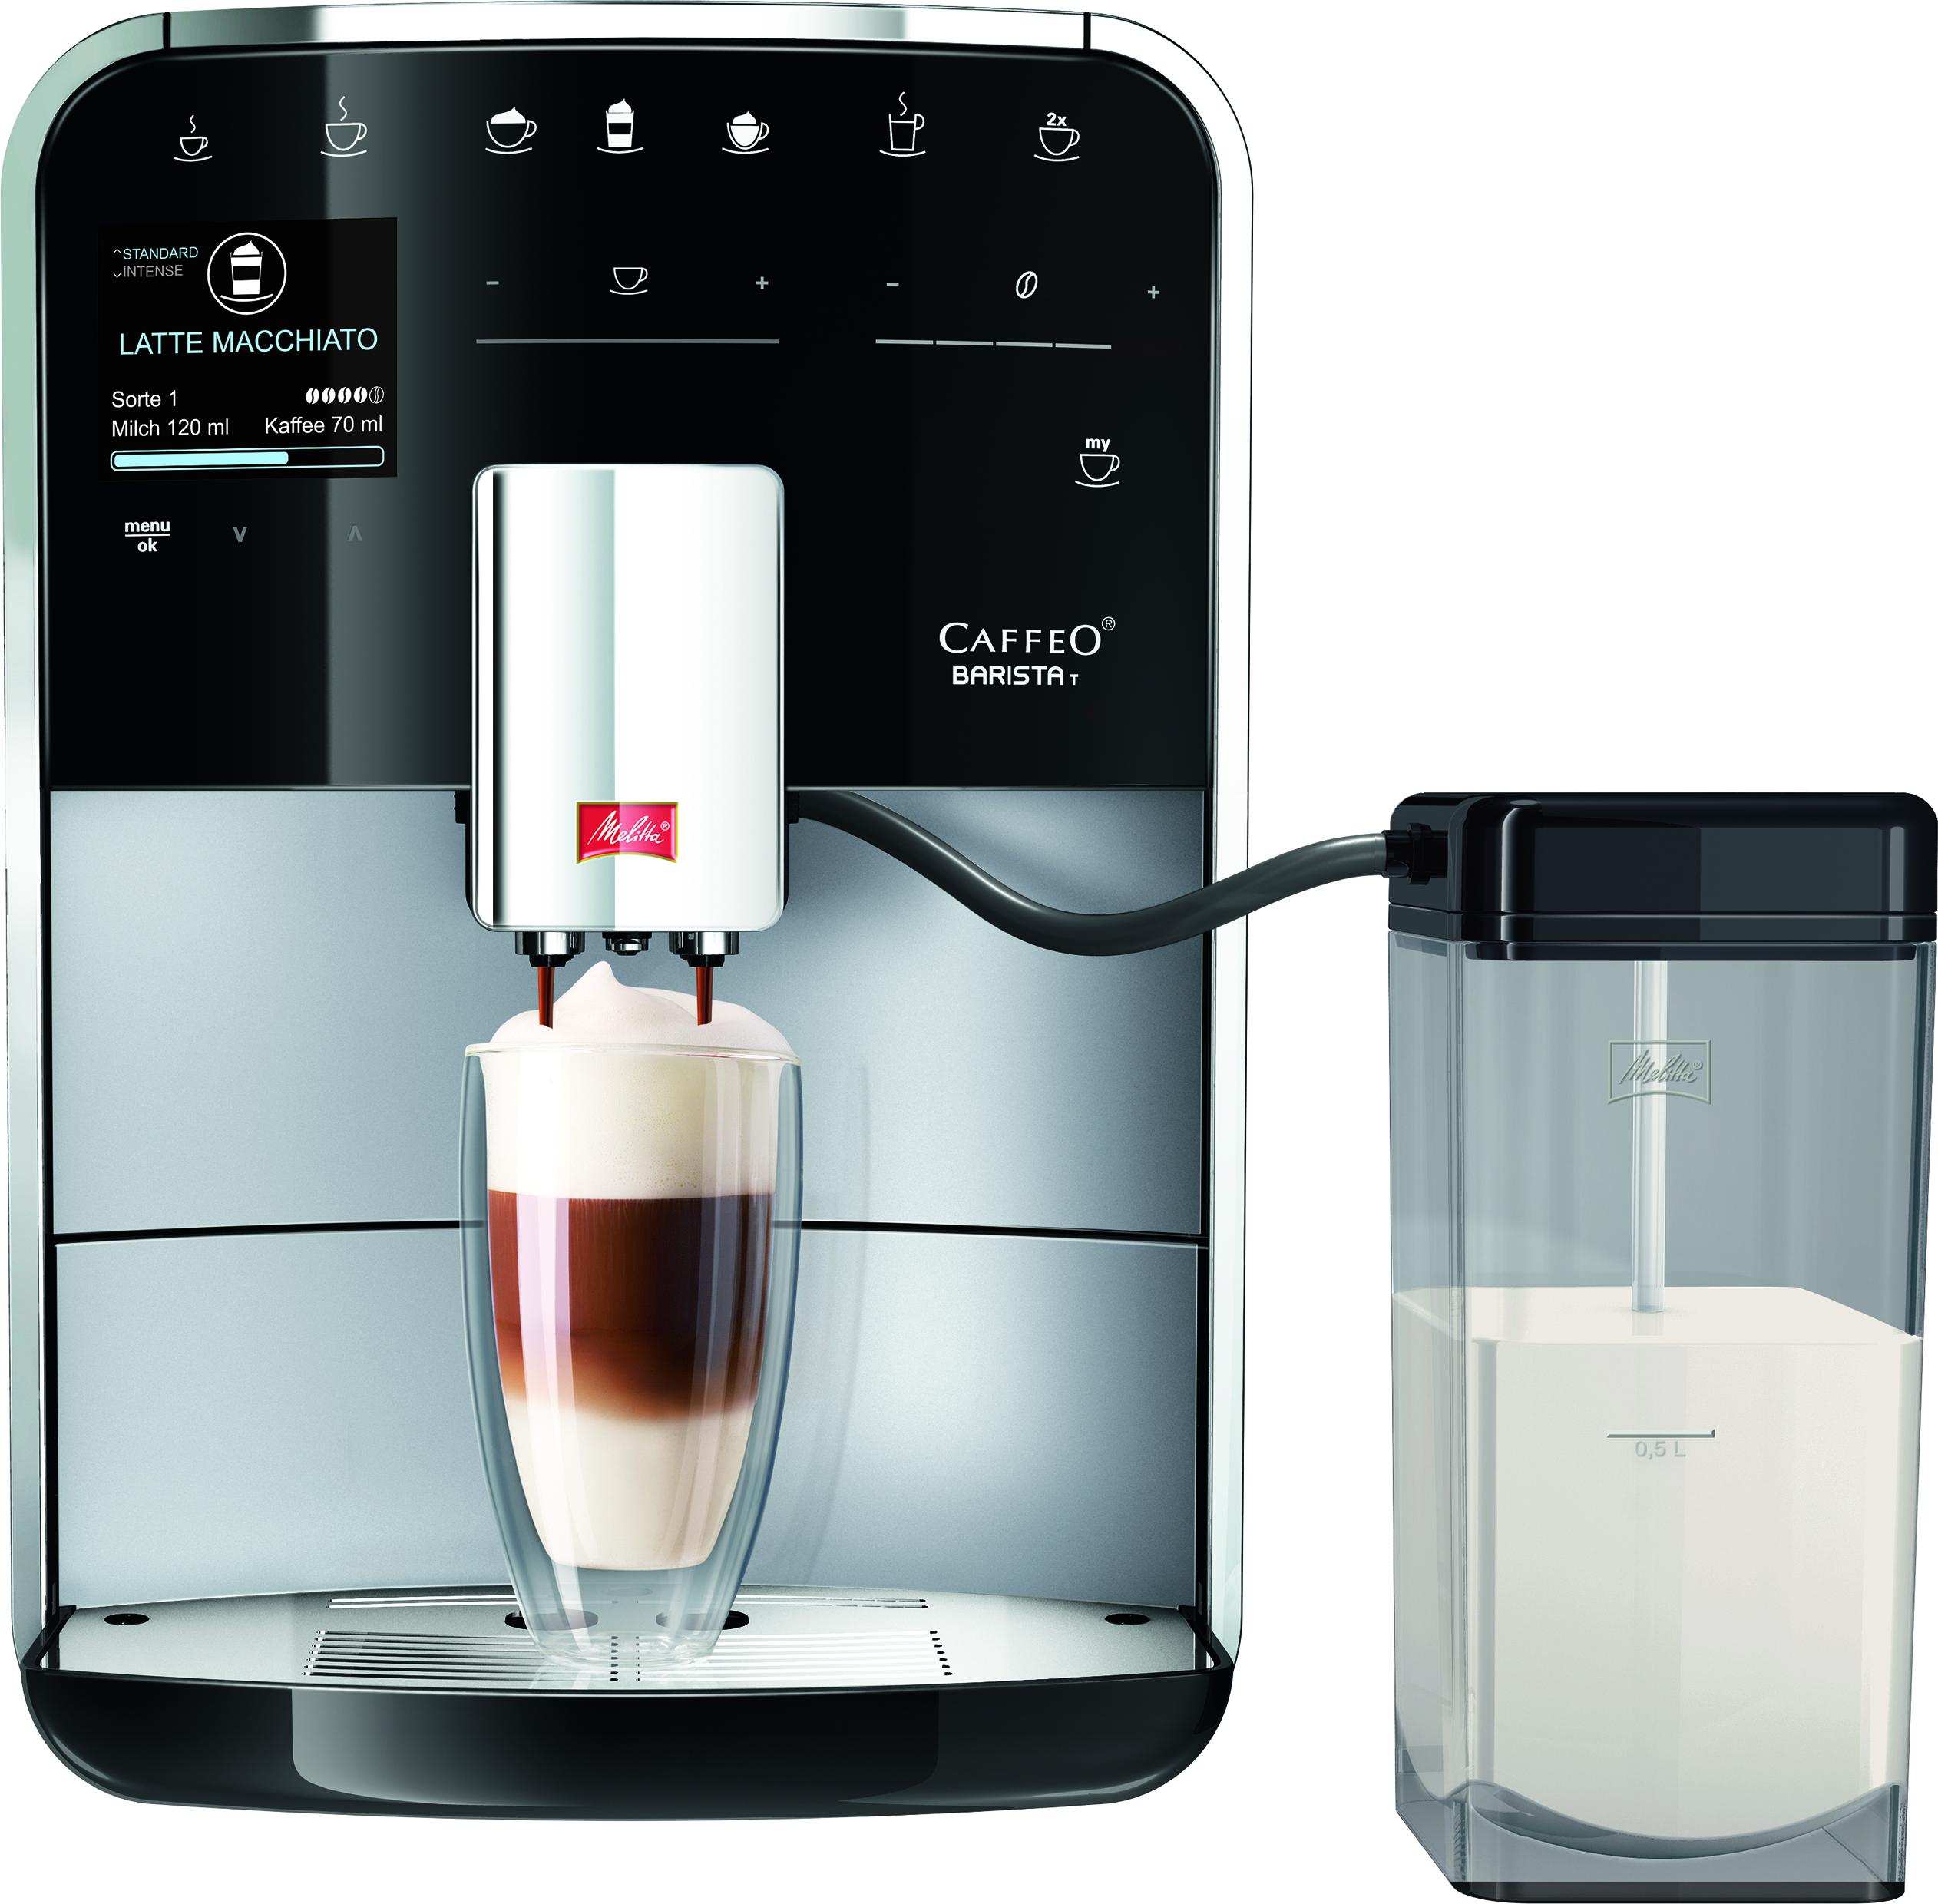 melitta kaffeevollautomat caffeo barista t. Black Bedroom Furniture Sets. Home Design Ideas